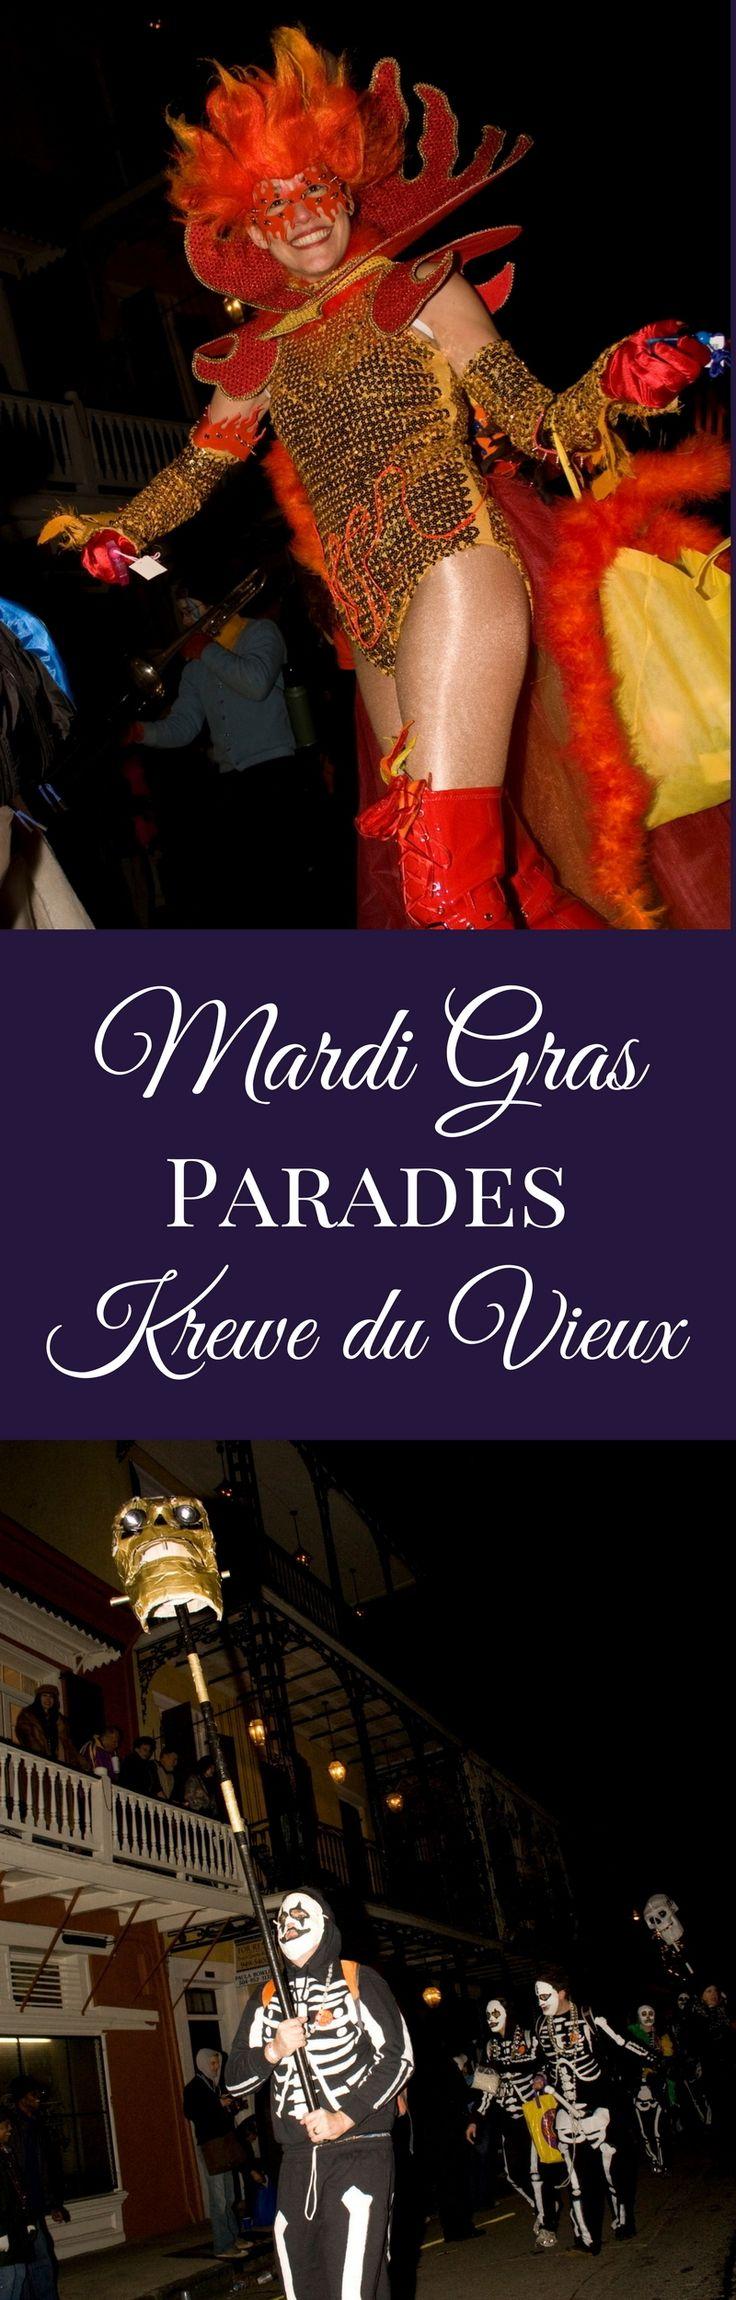 Ready, Set, Satire! Krewe du Vieux and krewedelusion Mardi Gras Parades